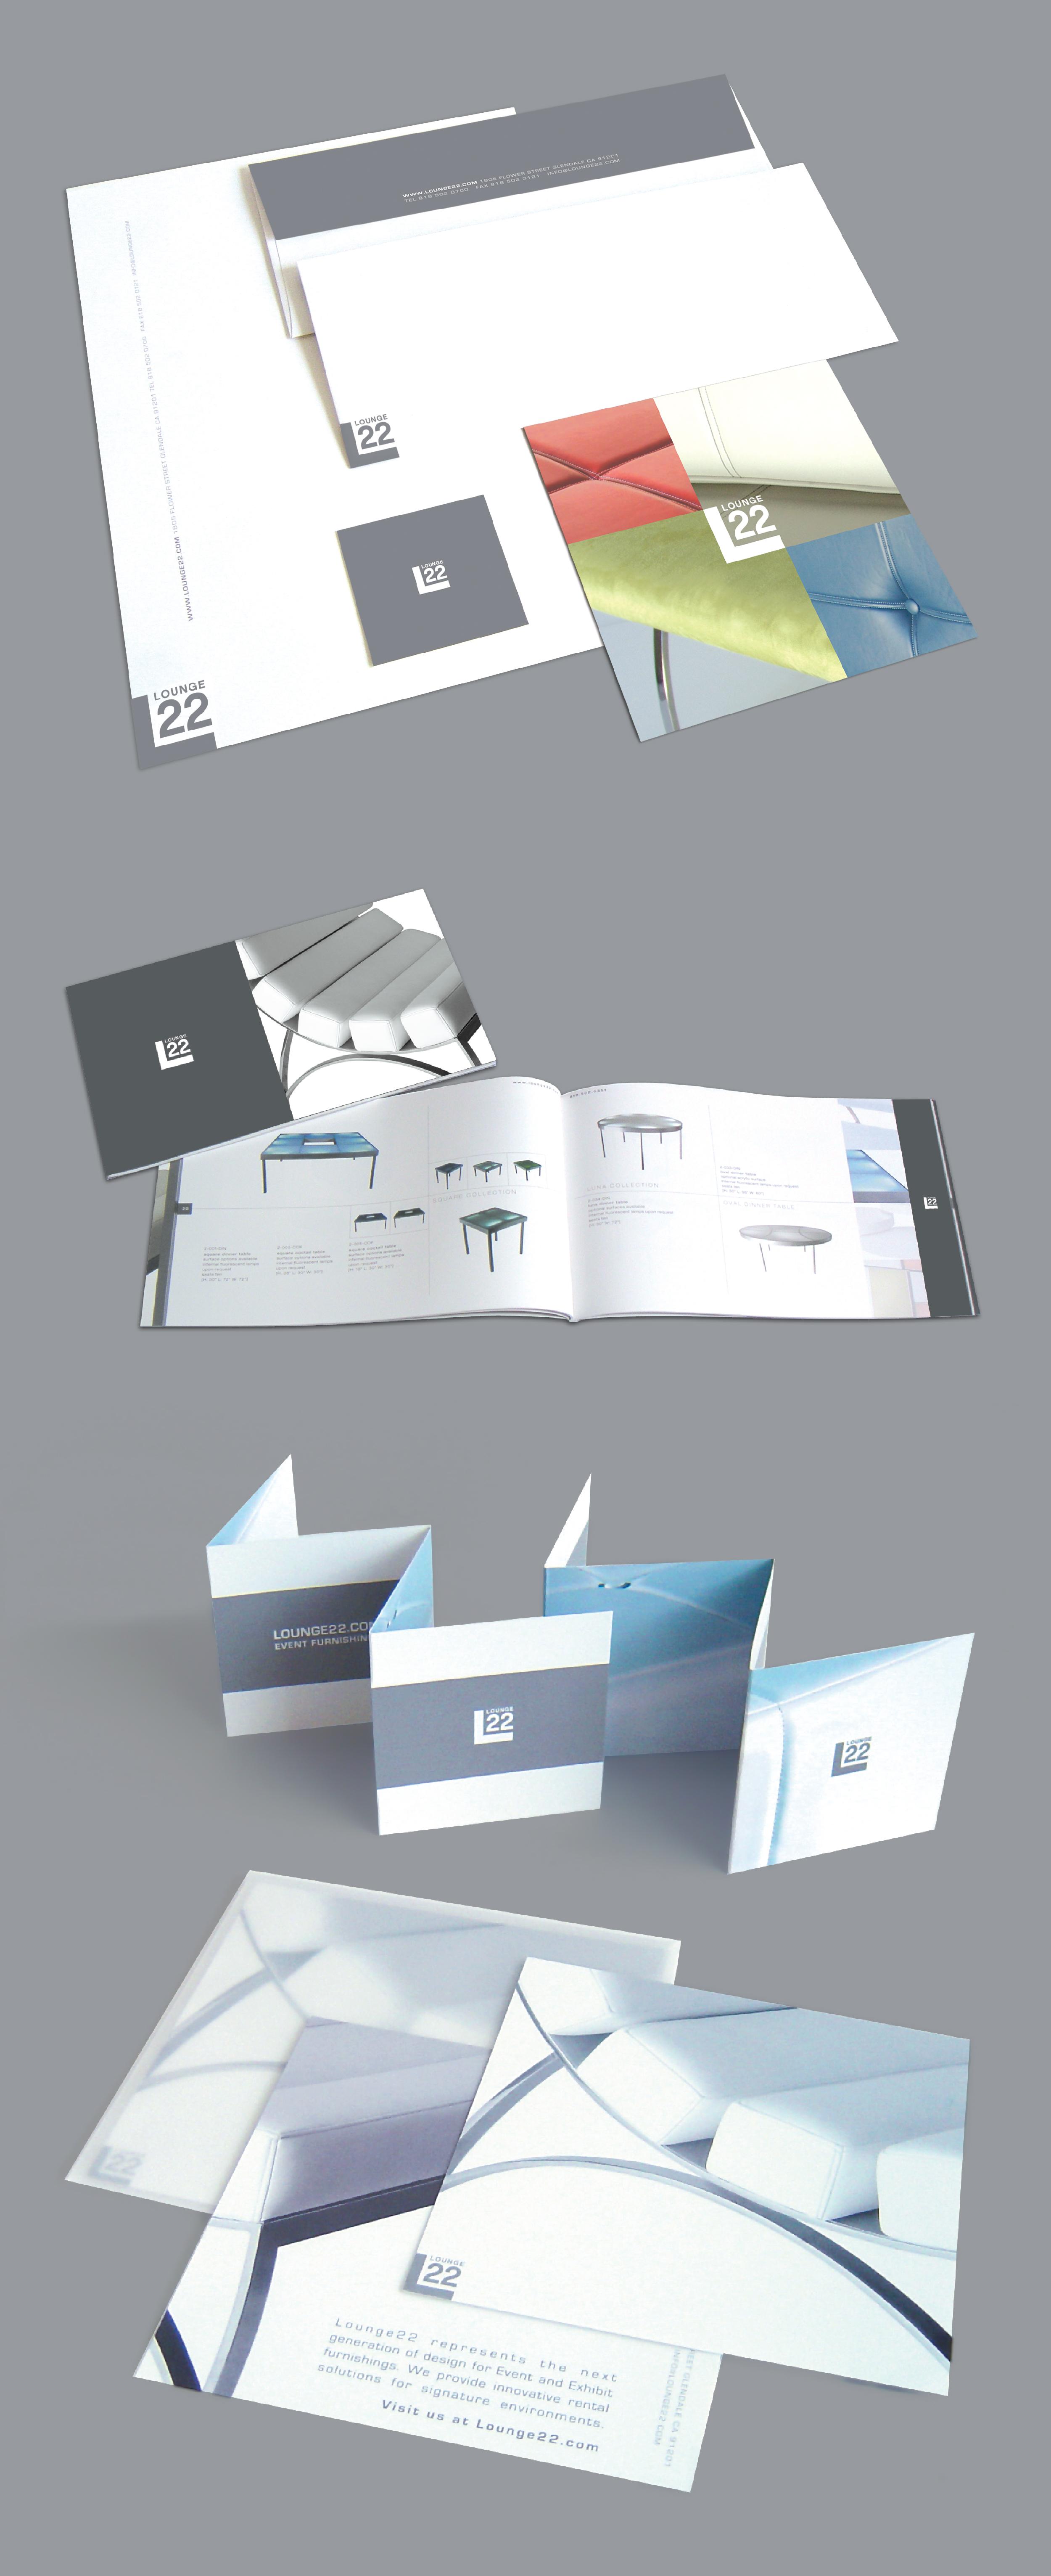 Brand_L22_4.jpg